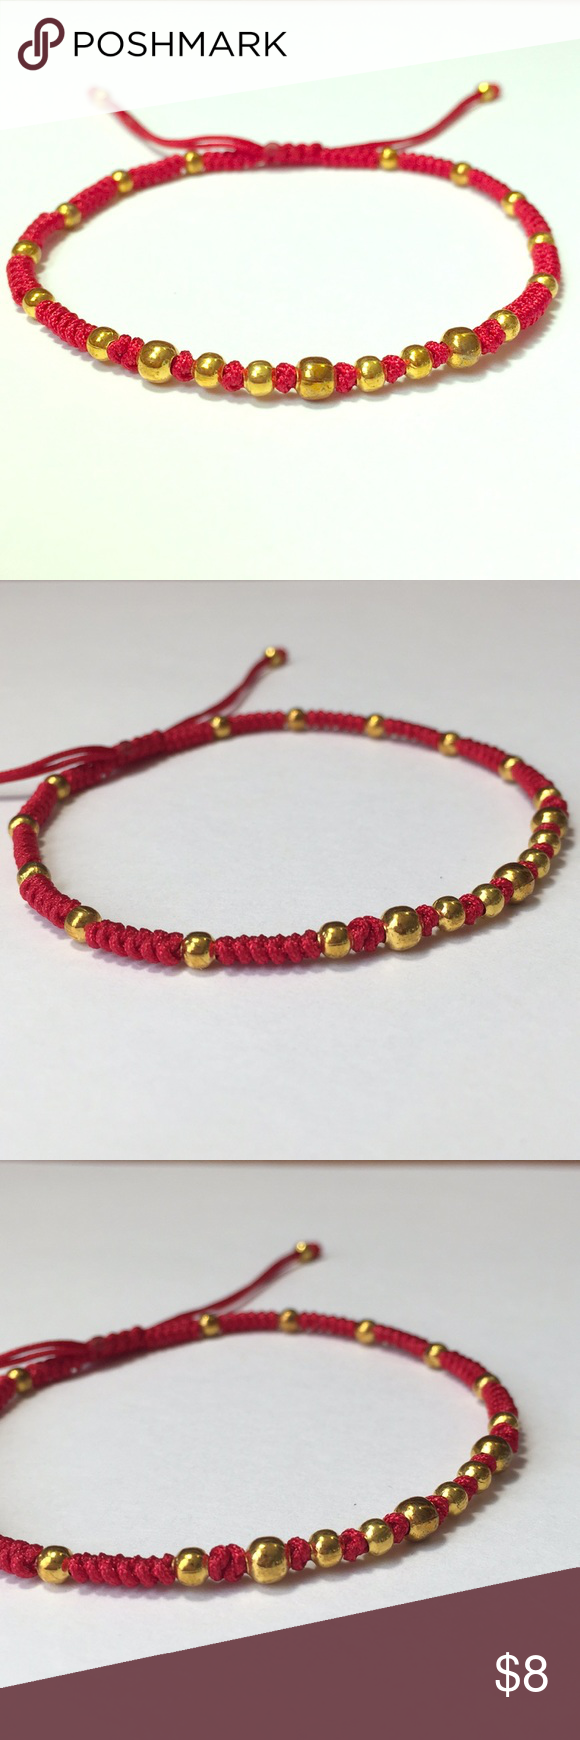 Simple gold lucky red string shamballa bracelet nwt my posh picks